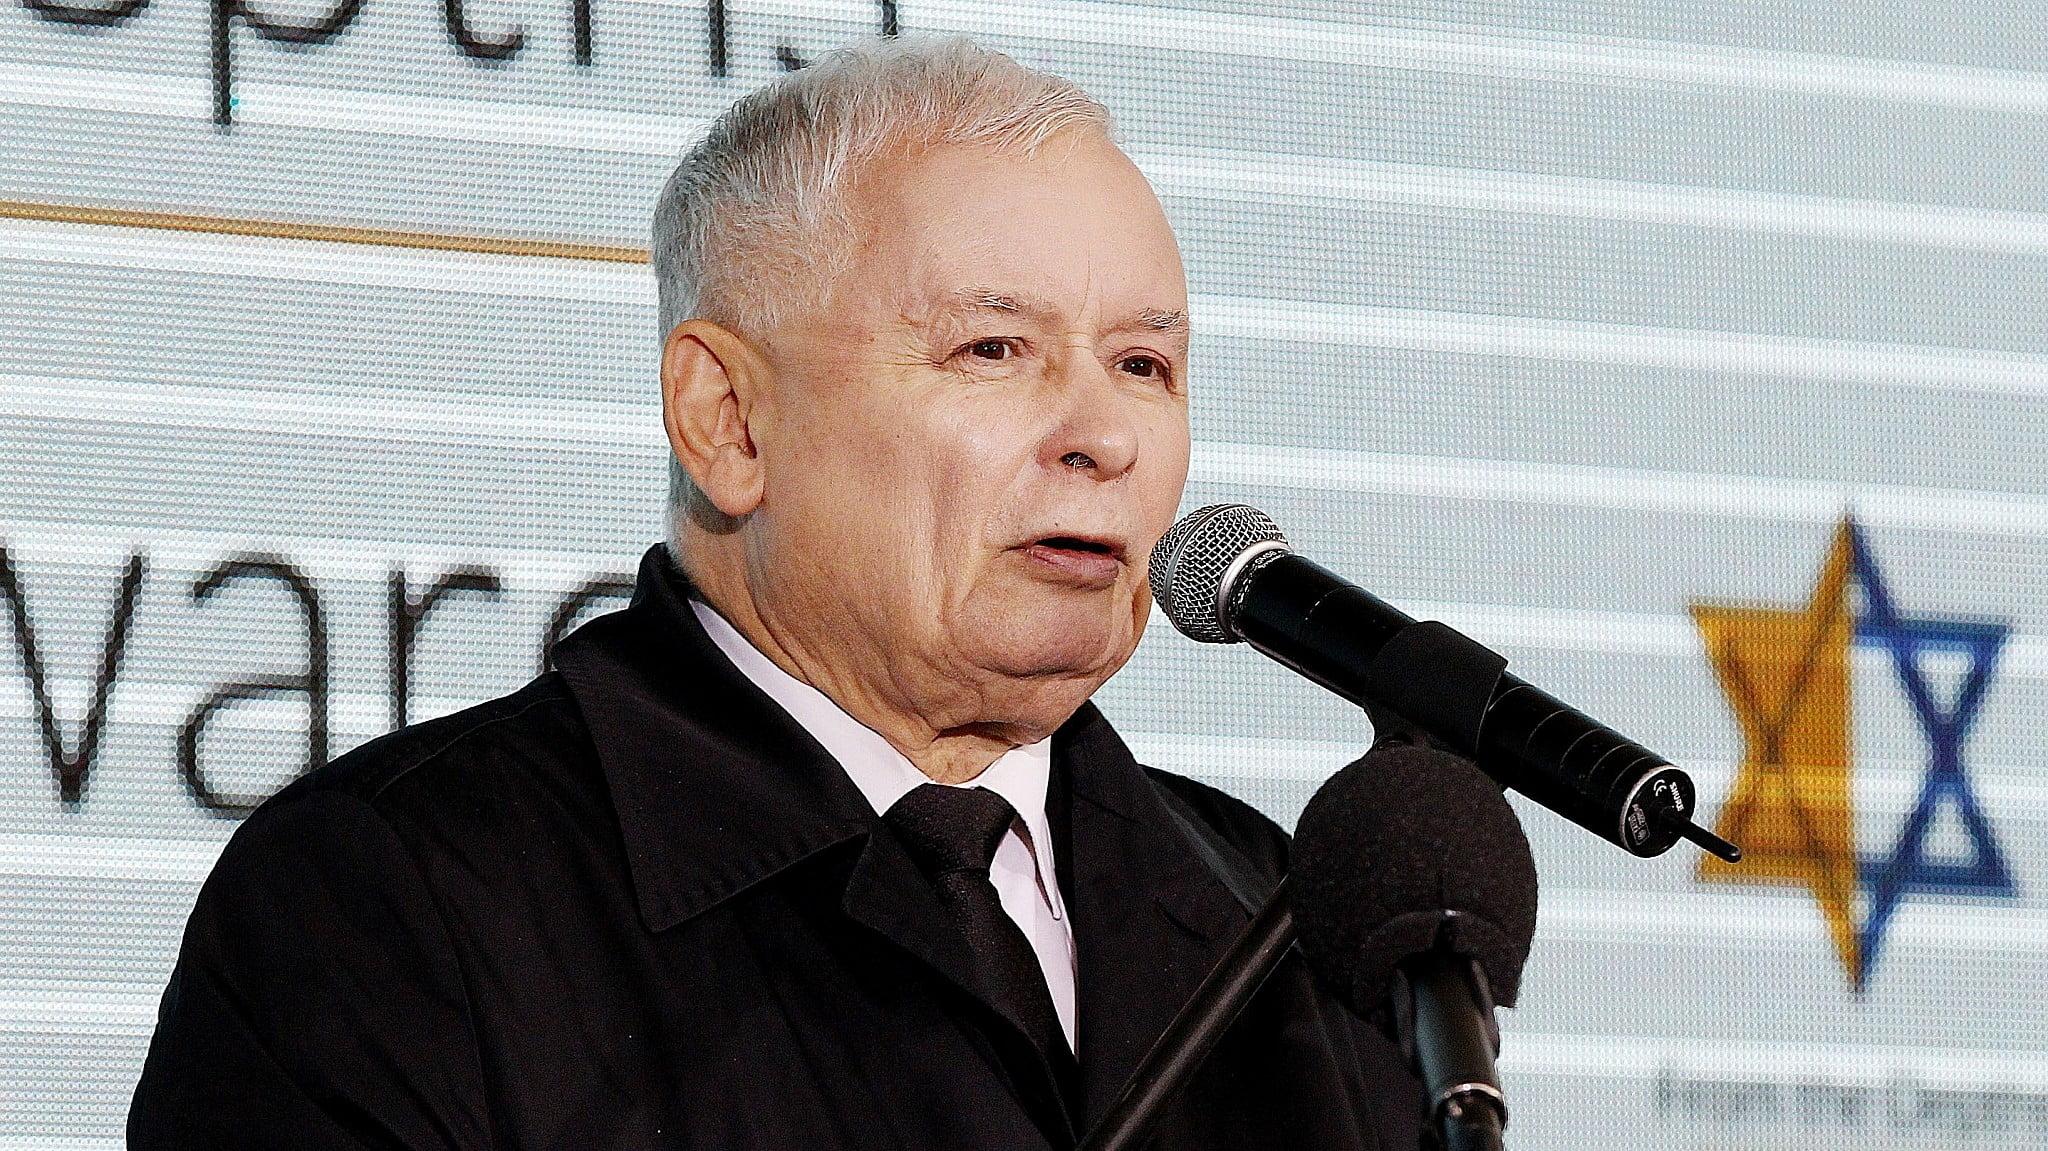 Image result for Holocaust Law a legislative failure political mistake